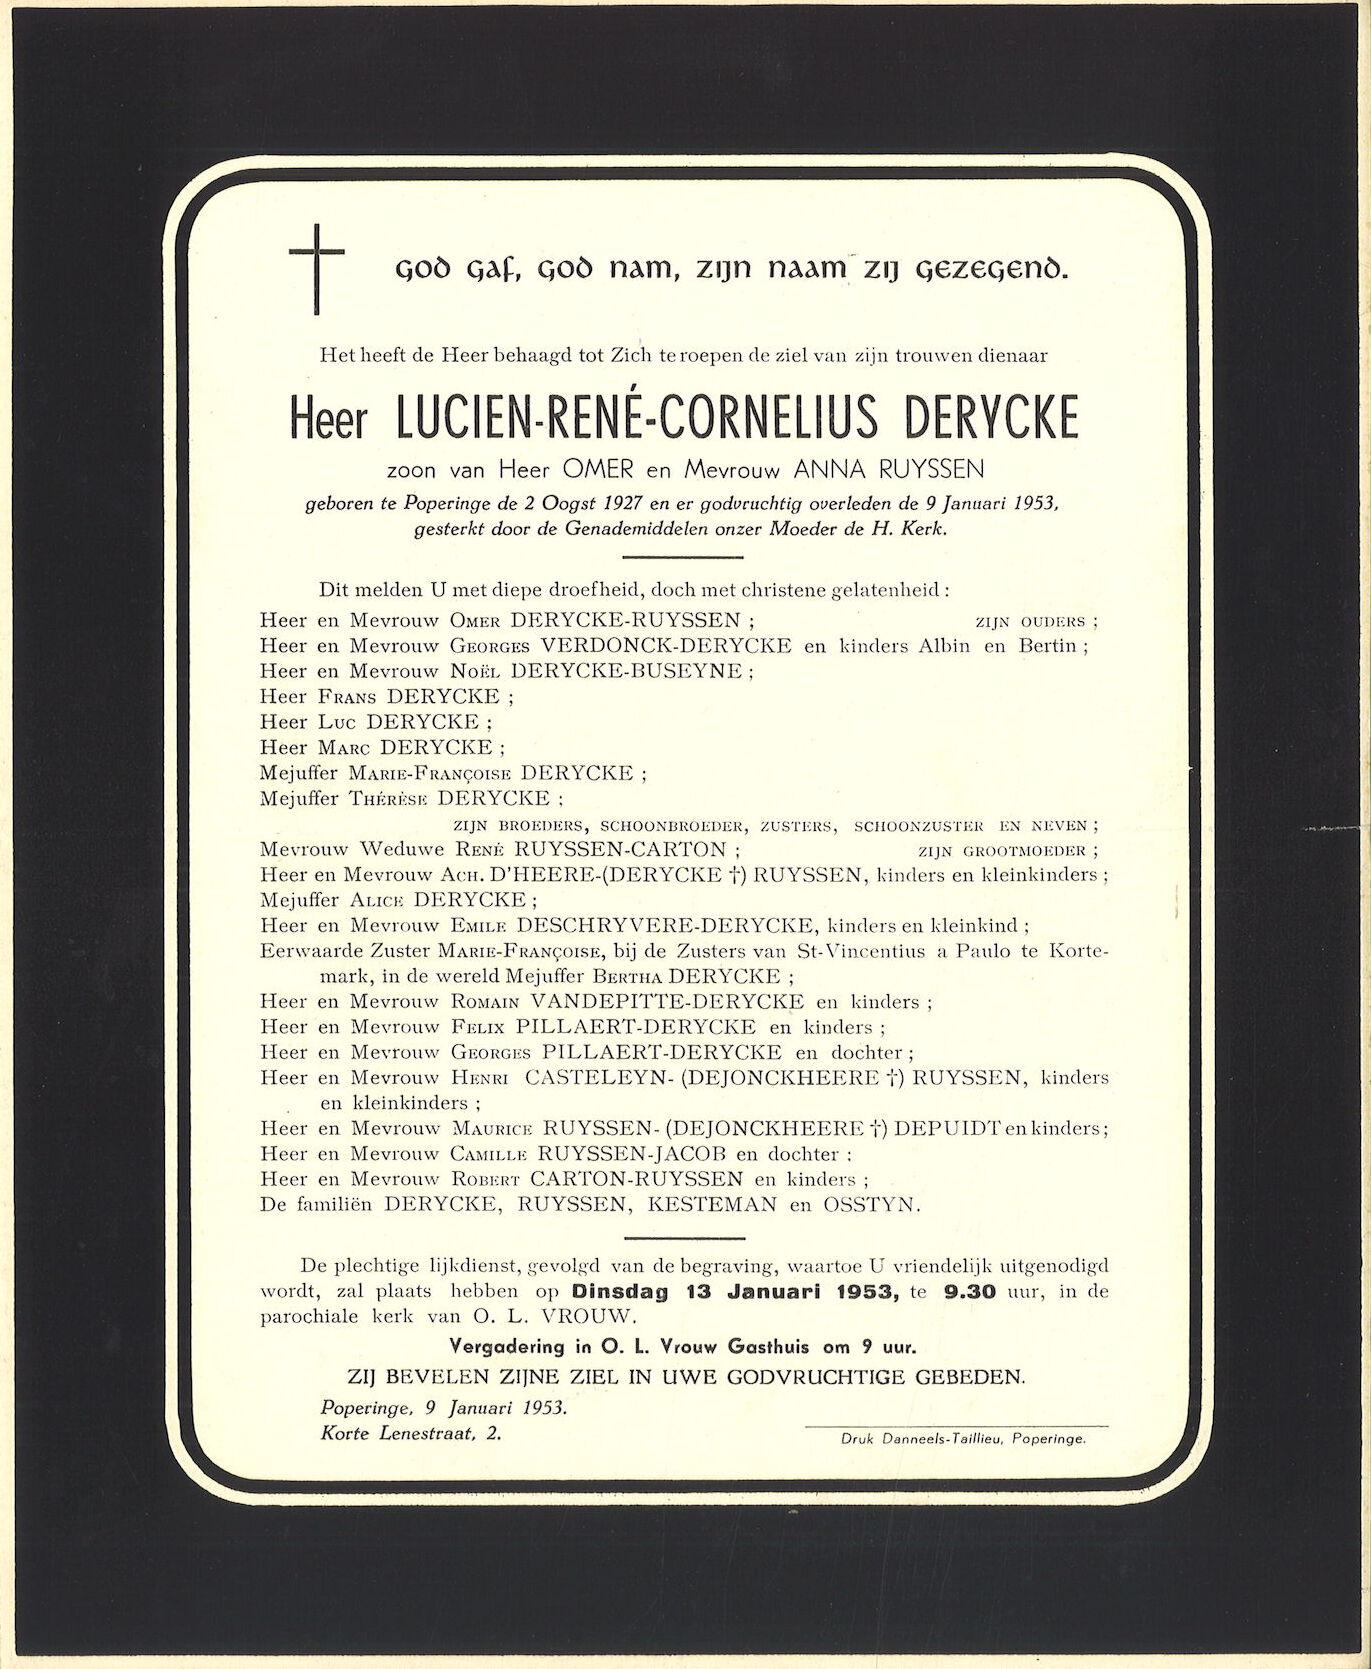 Lucien-René-Cornelius Derycke